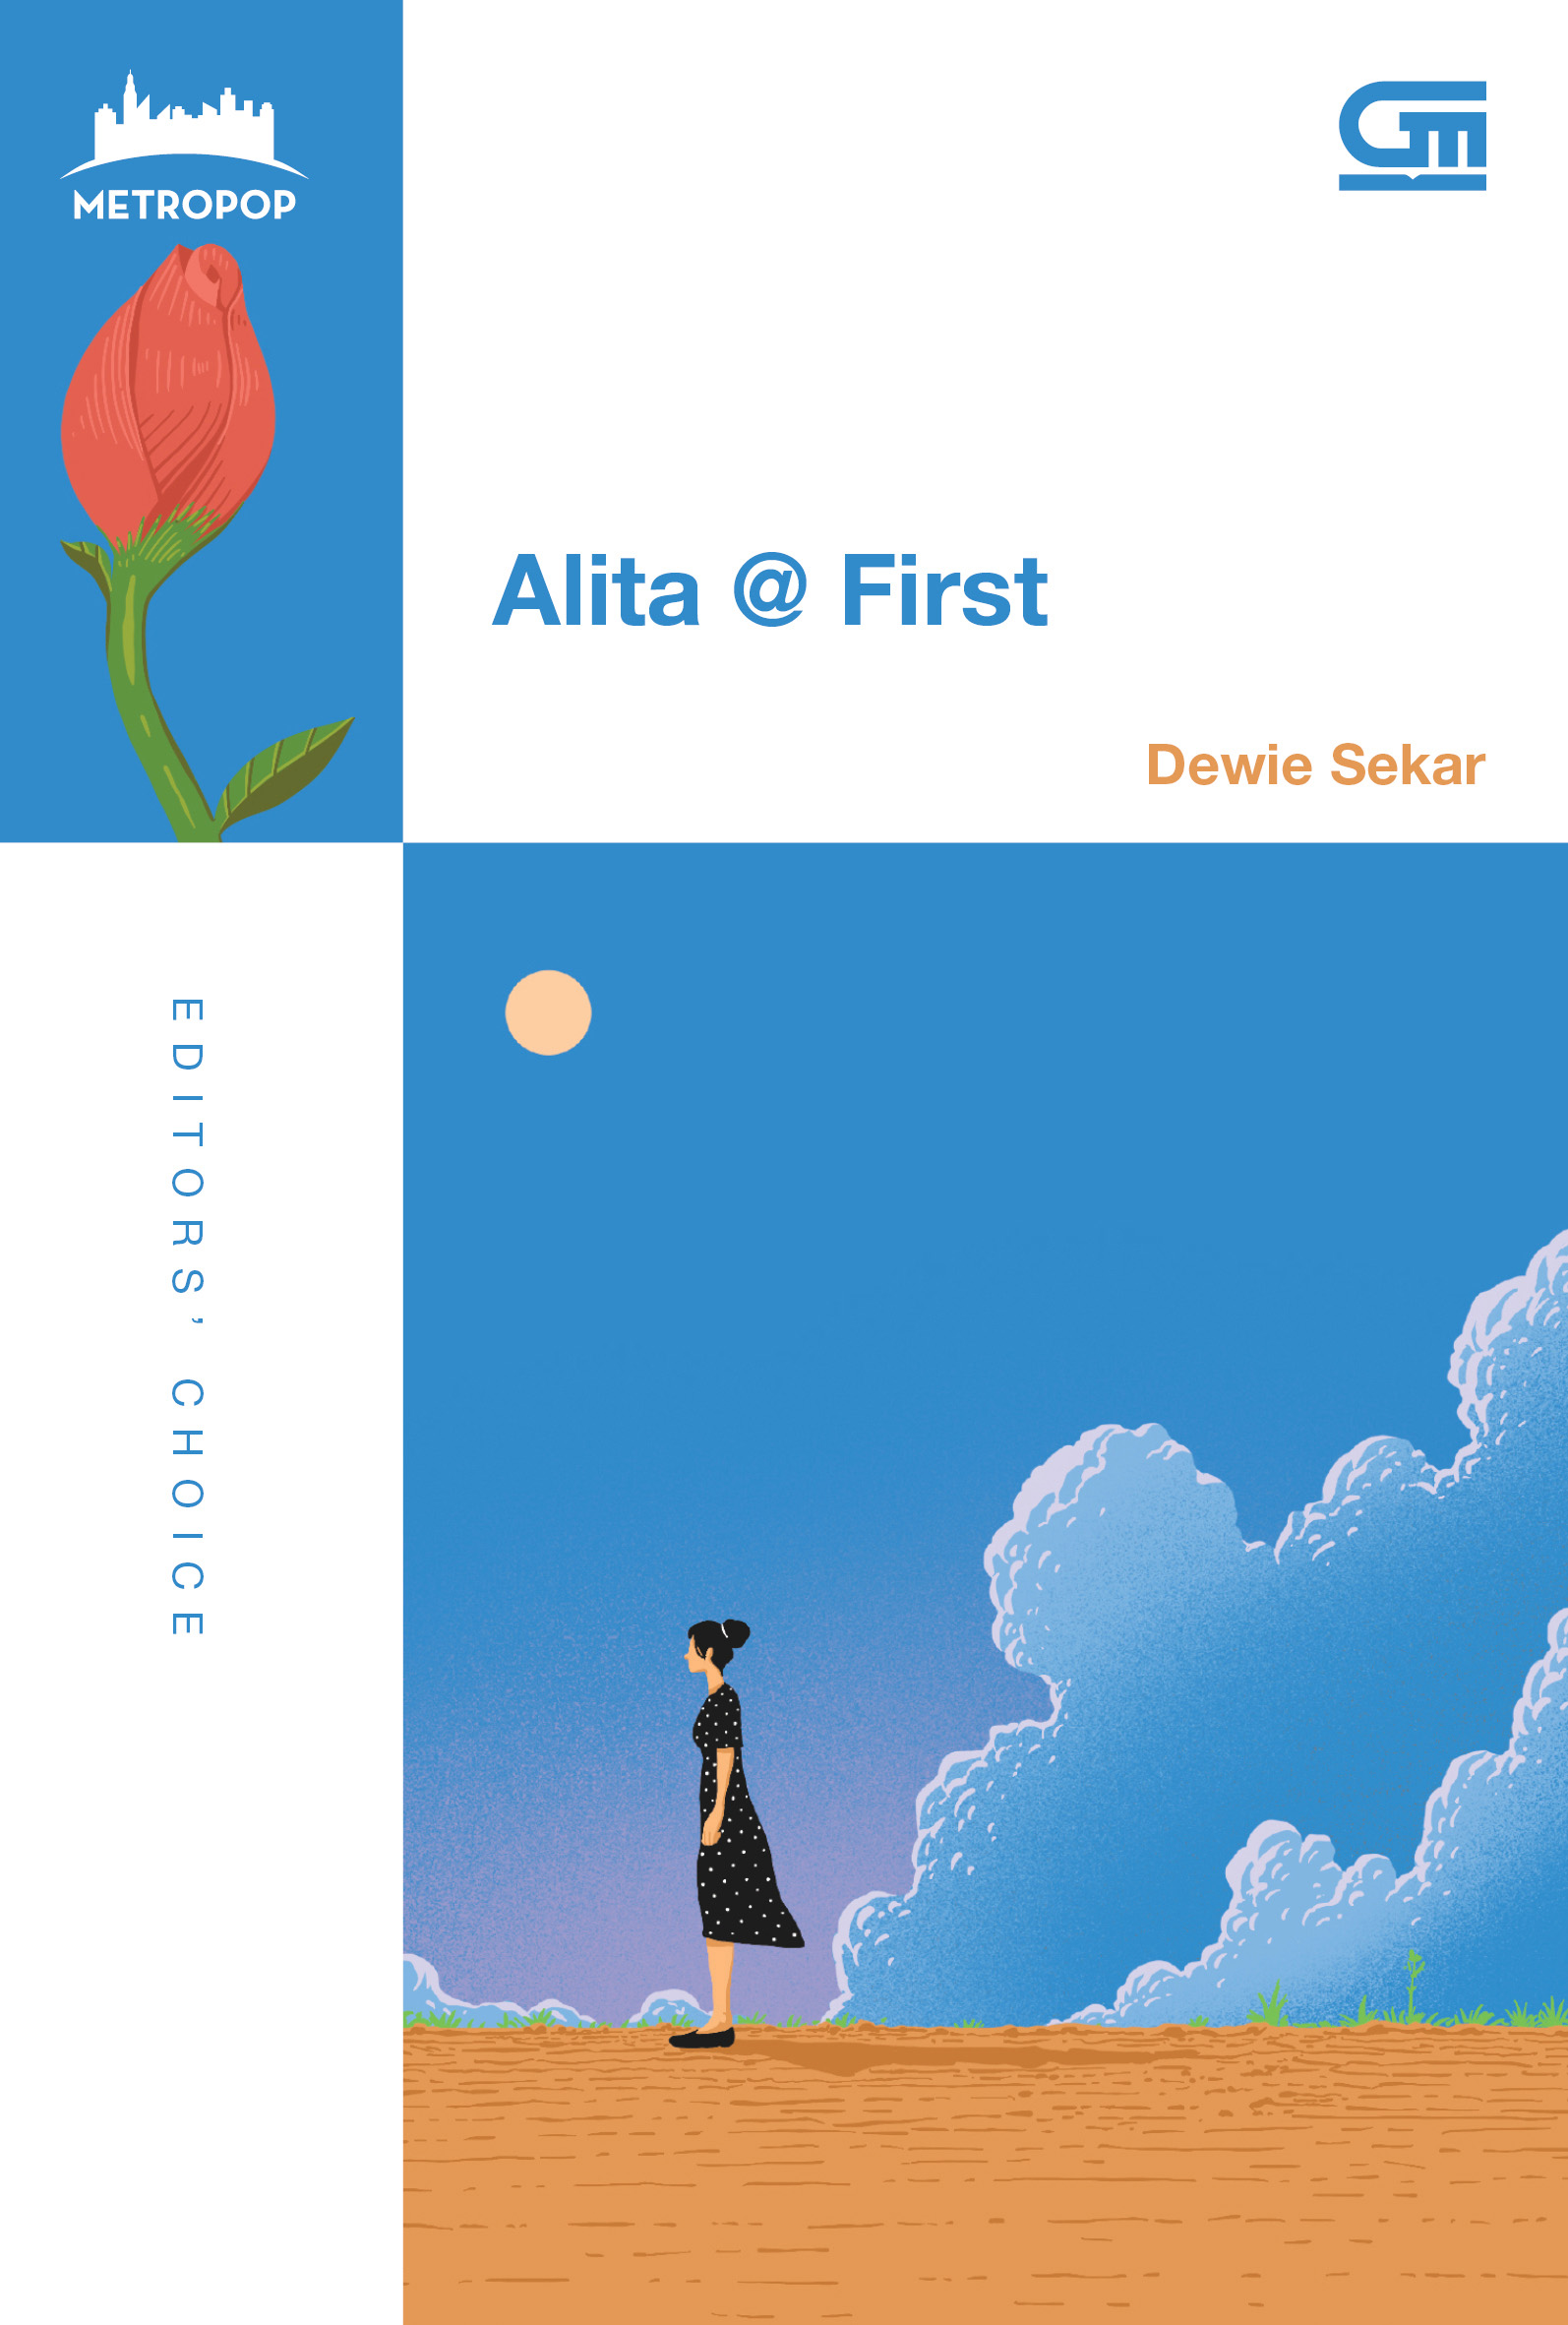 Alita @First